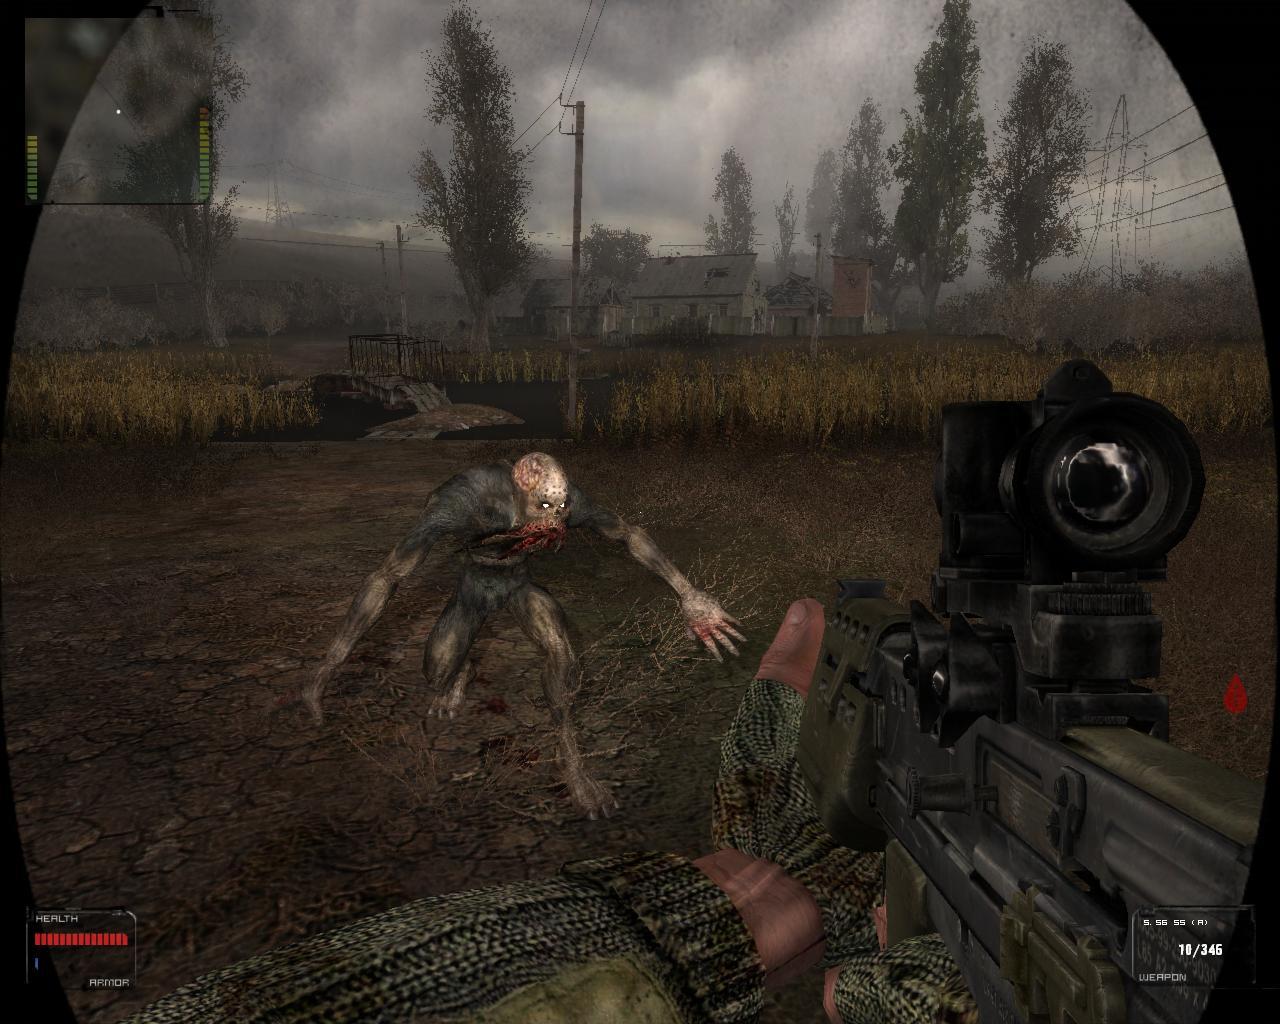 Stalker in the swamp house